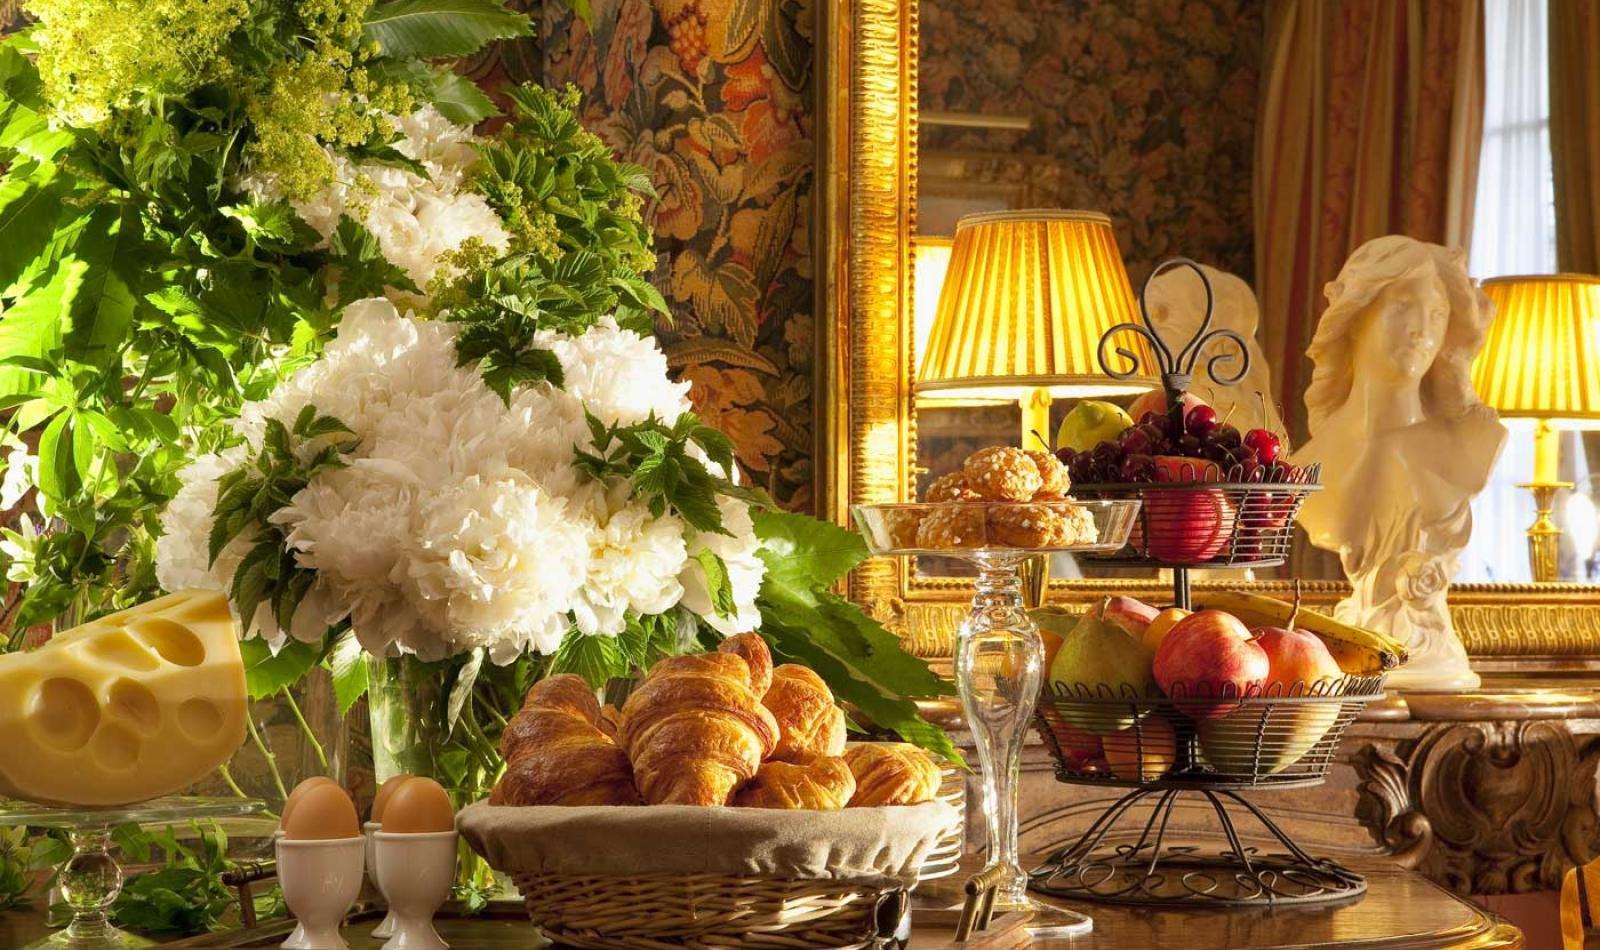 Hotel d'Angleterre - Salle du petit-déjeuner